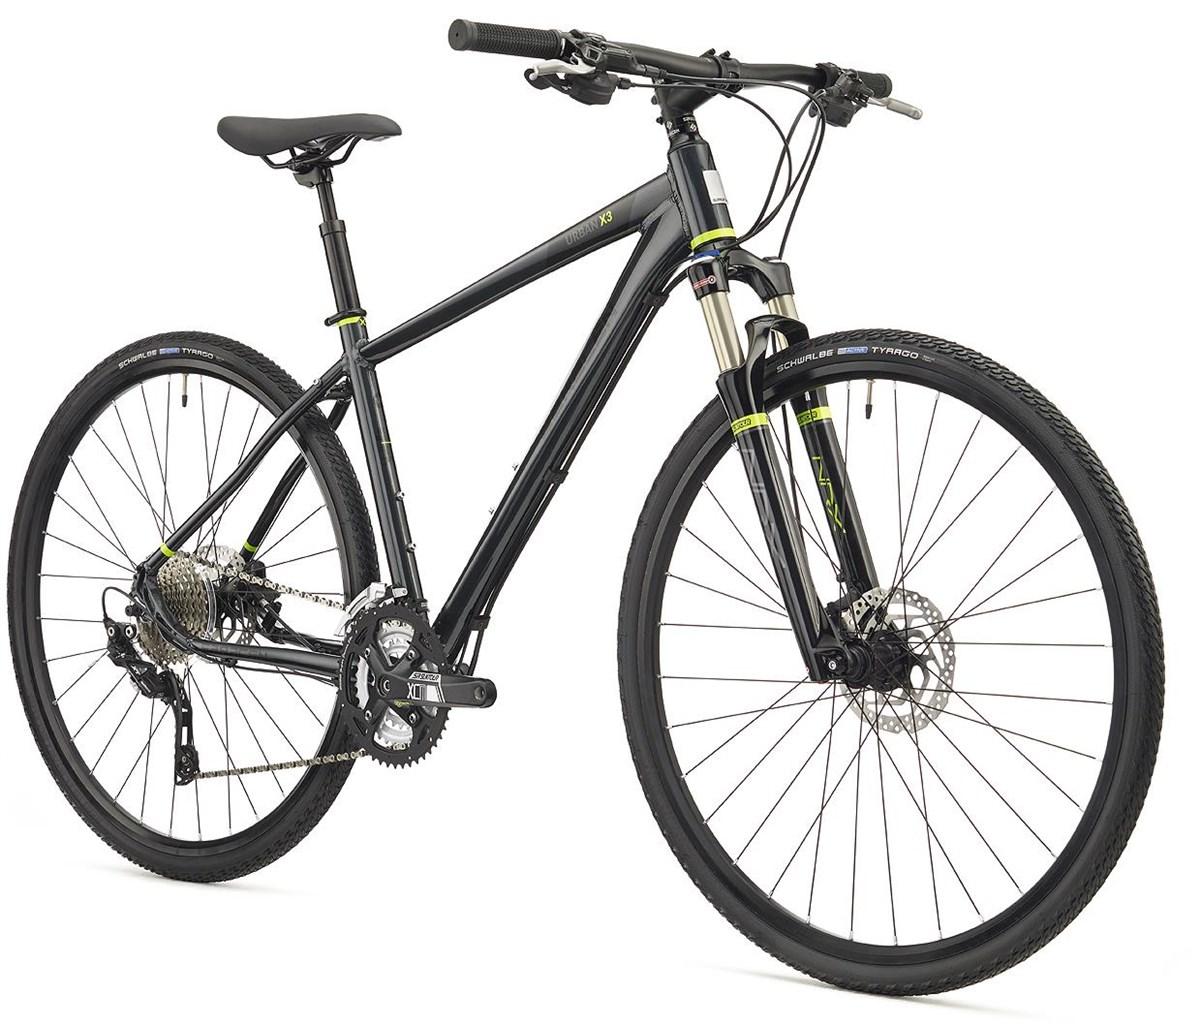 Saracen Urban Cross 3 2018 - Hybrid Sports Bike | City-cykler